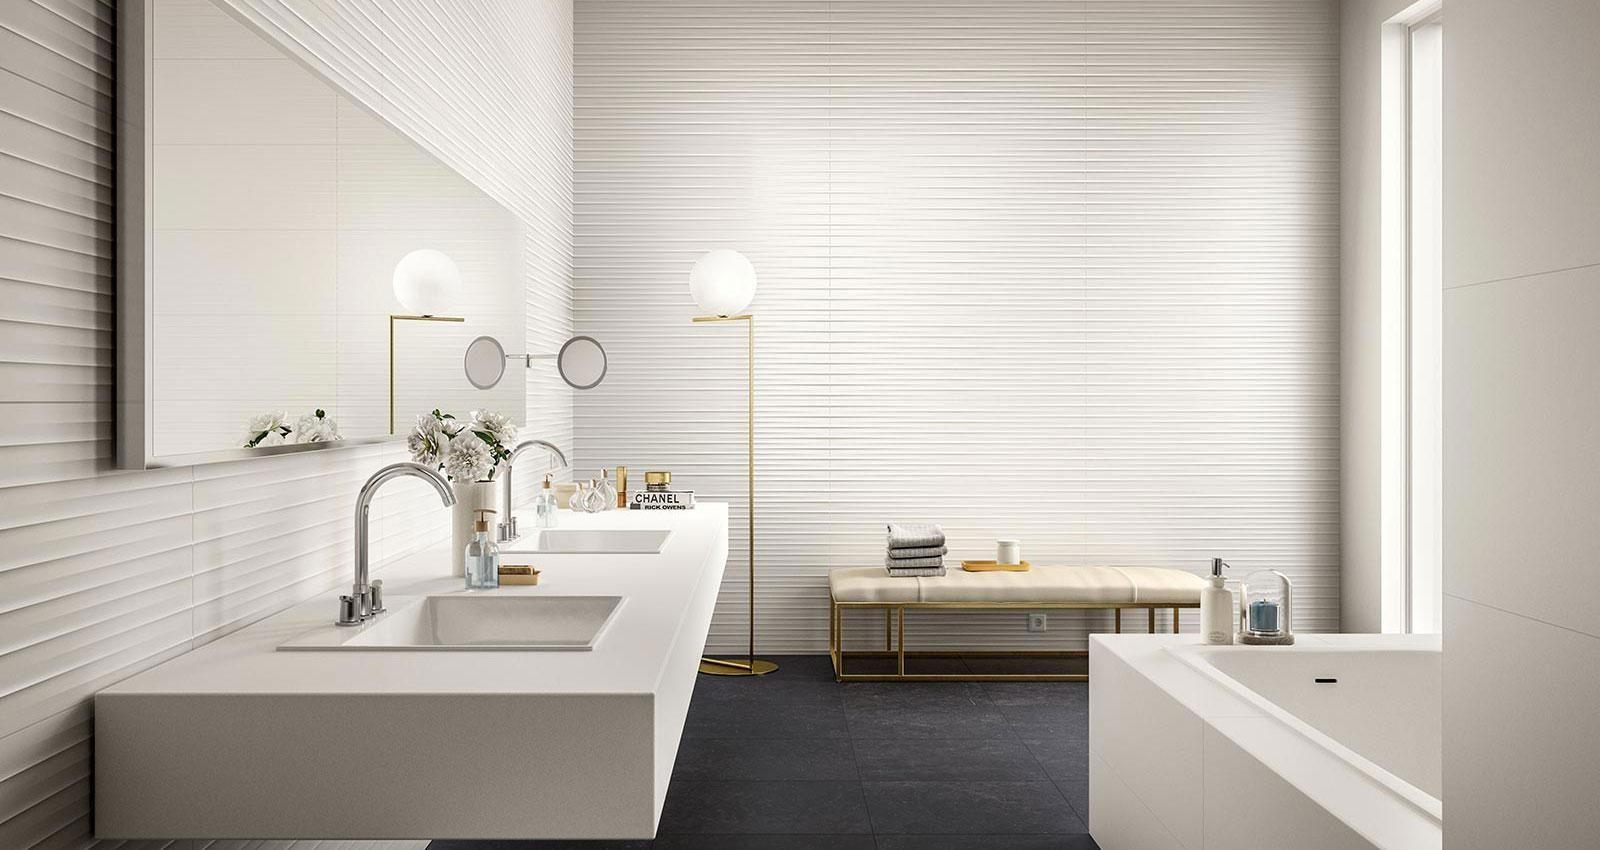 Sanitairsupershop Inspiratie Marazzi Essenziale Tegels Badkamer Woonkamer Vloertegels Wan Patterned Bathroom Tiles White Bathroom Tiles Tile Bathroom